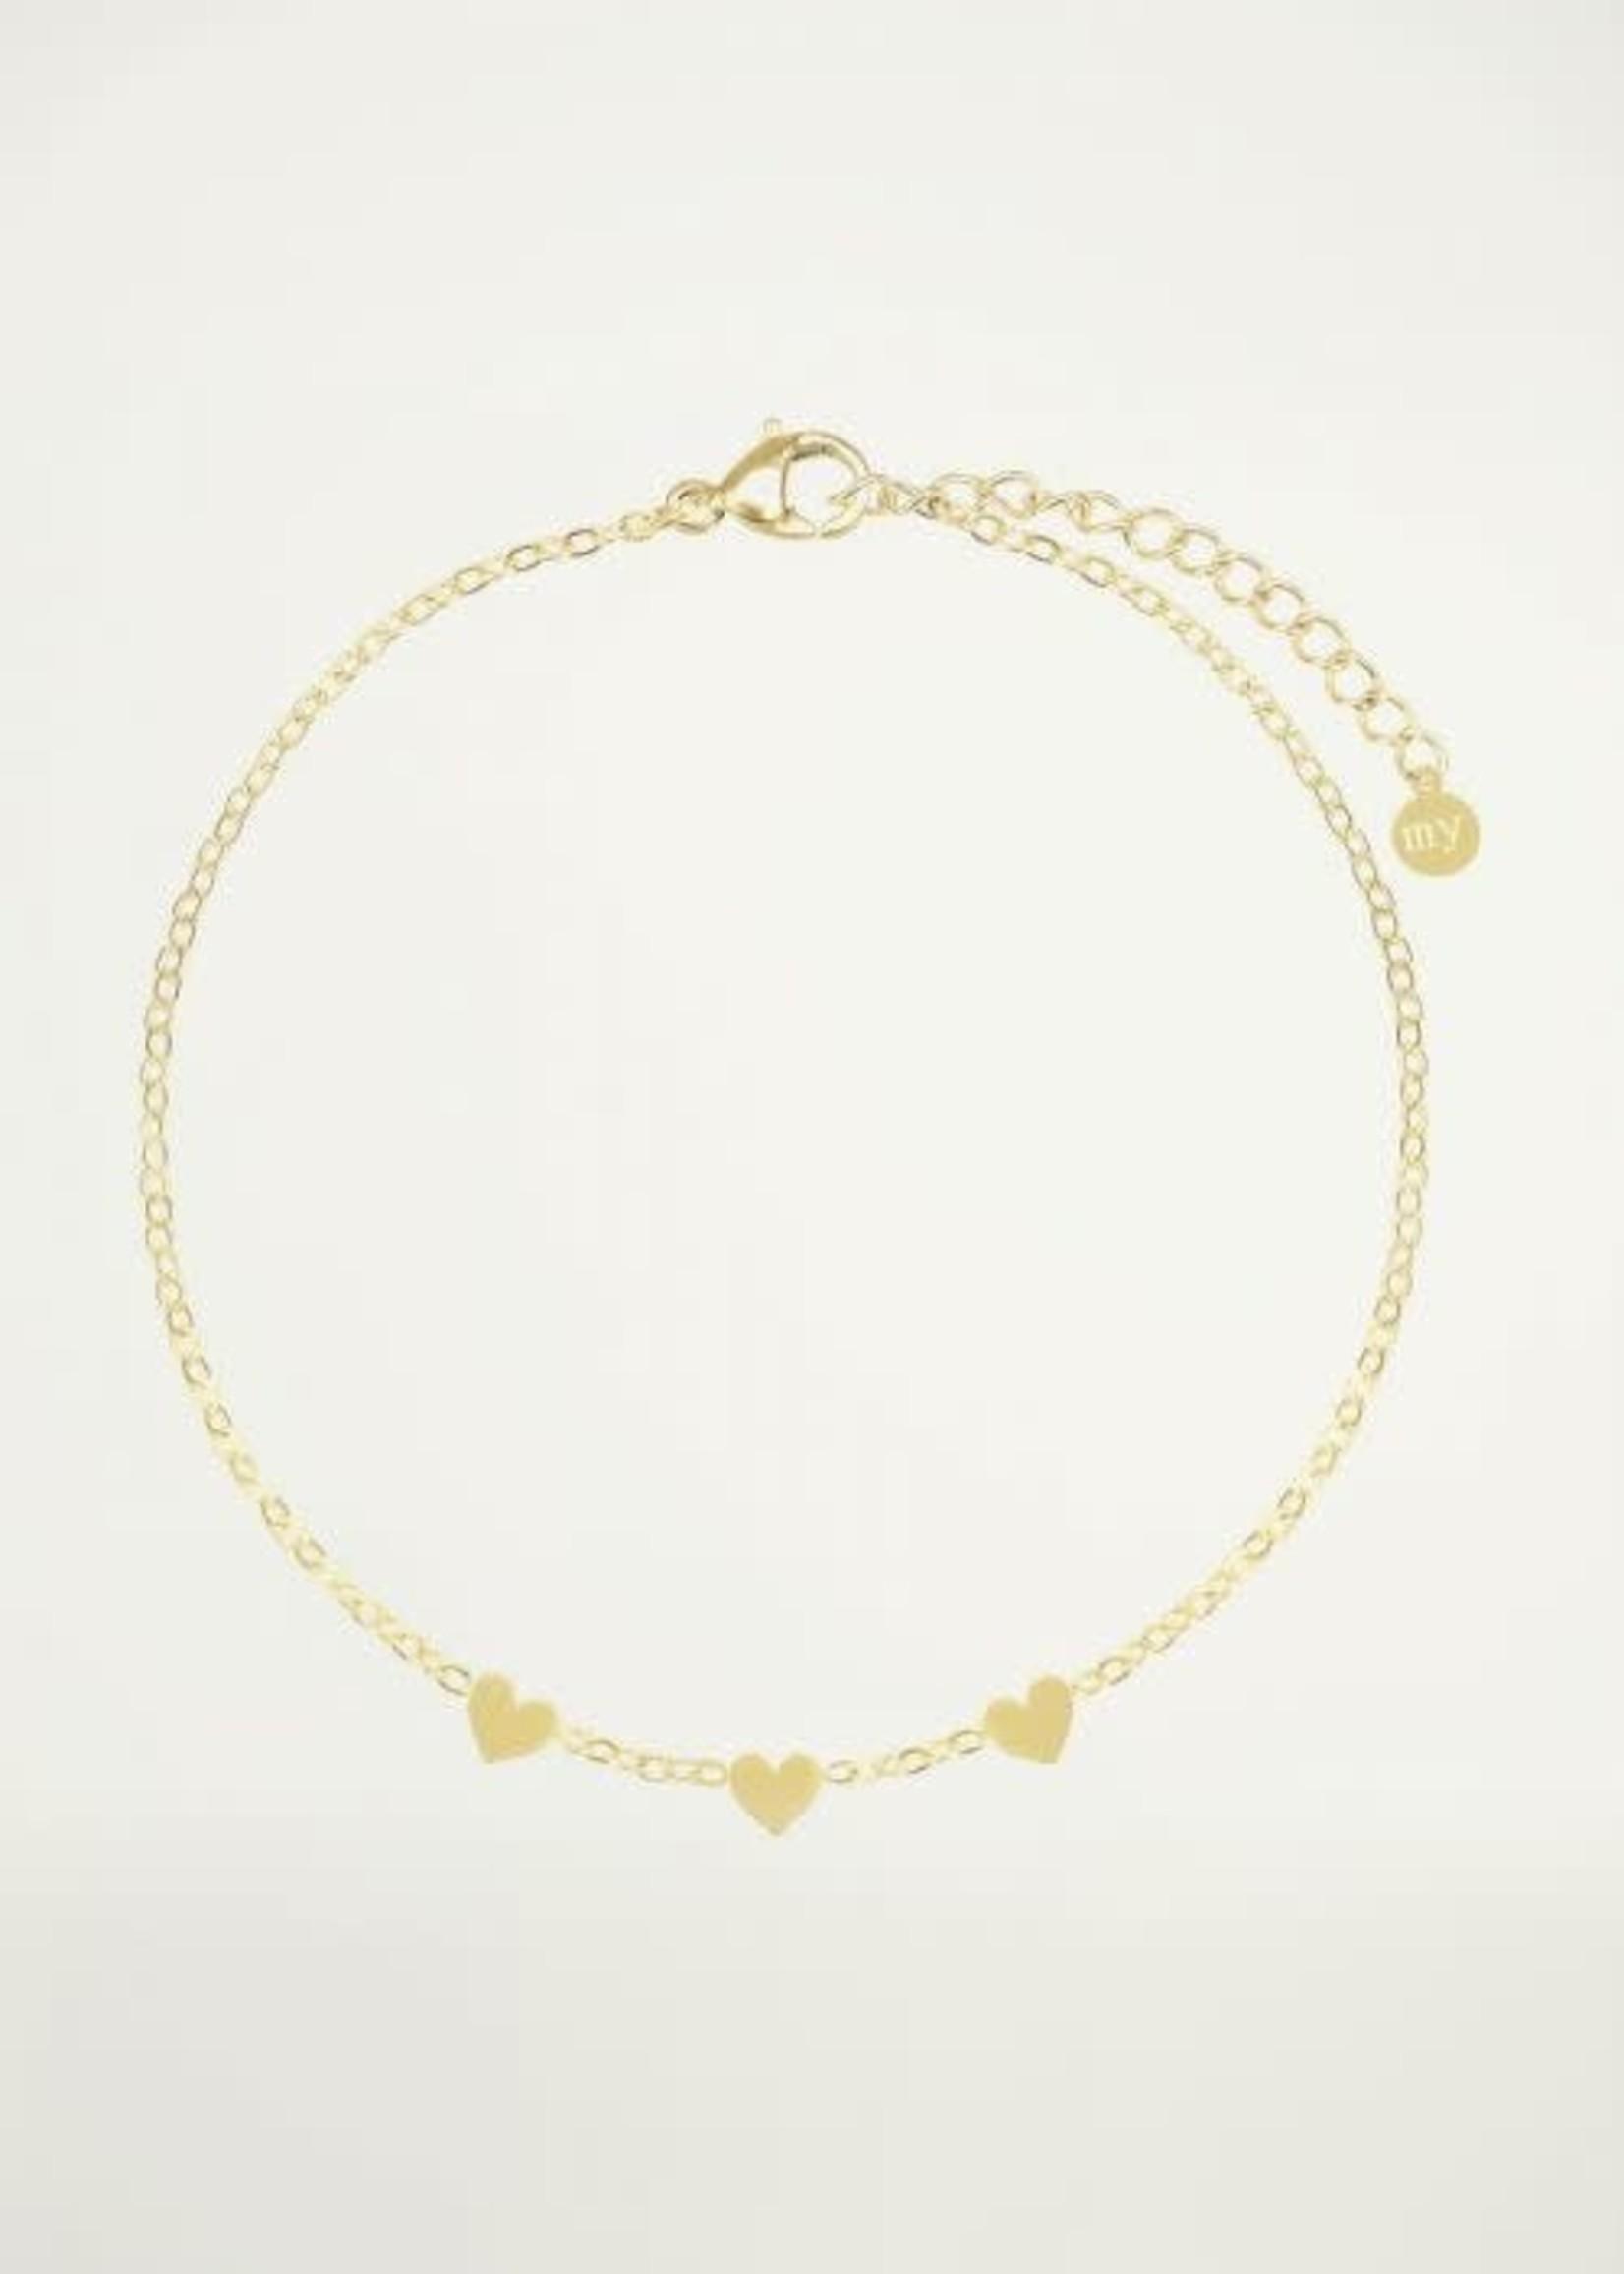 My Jewellery My Jewellery graduation armband